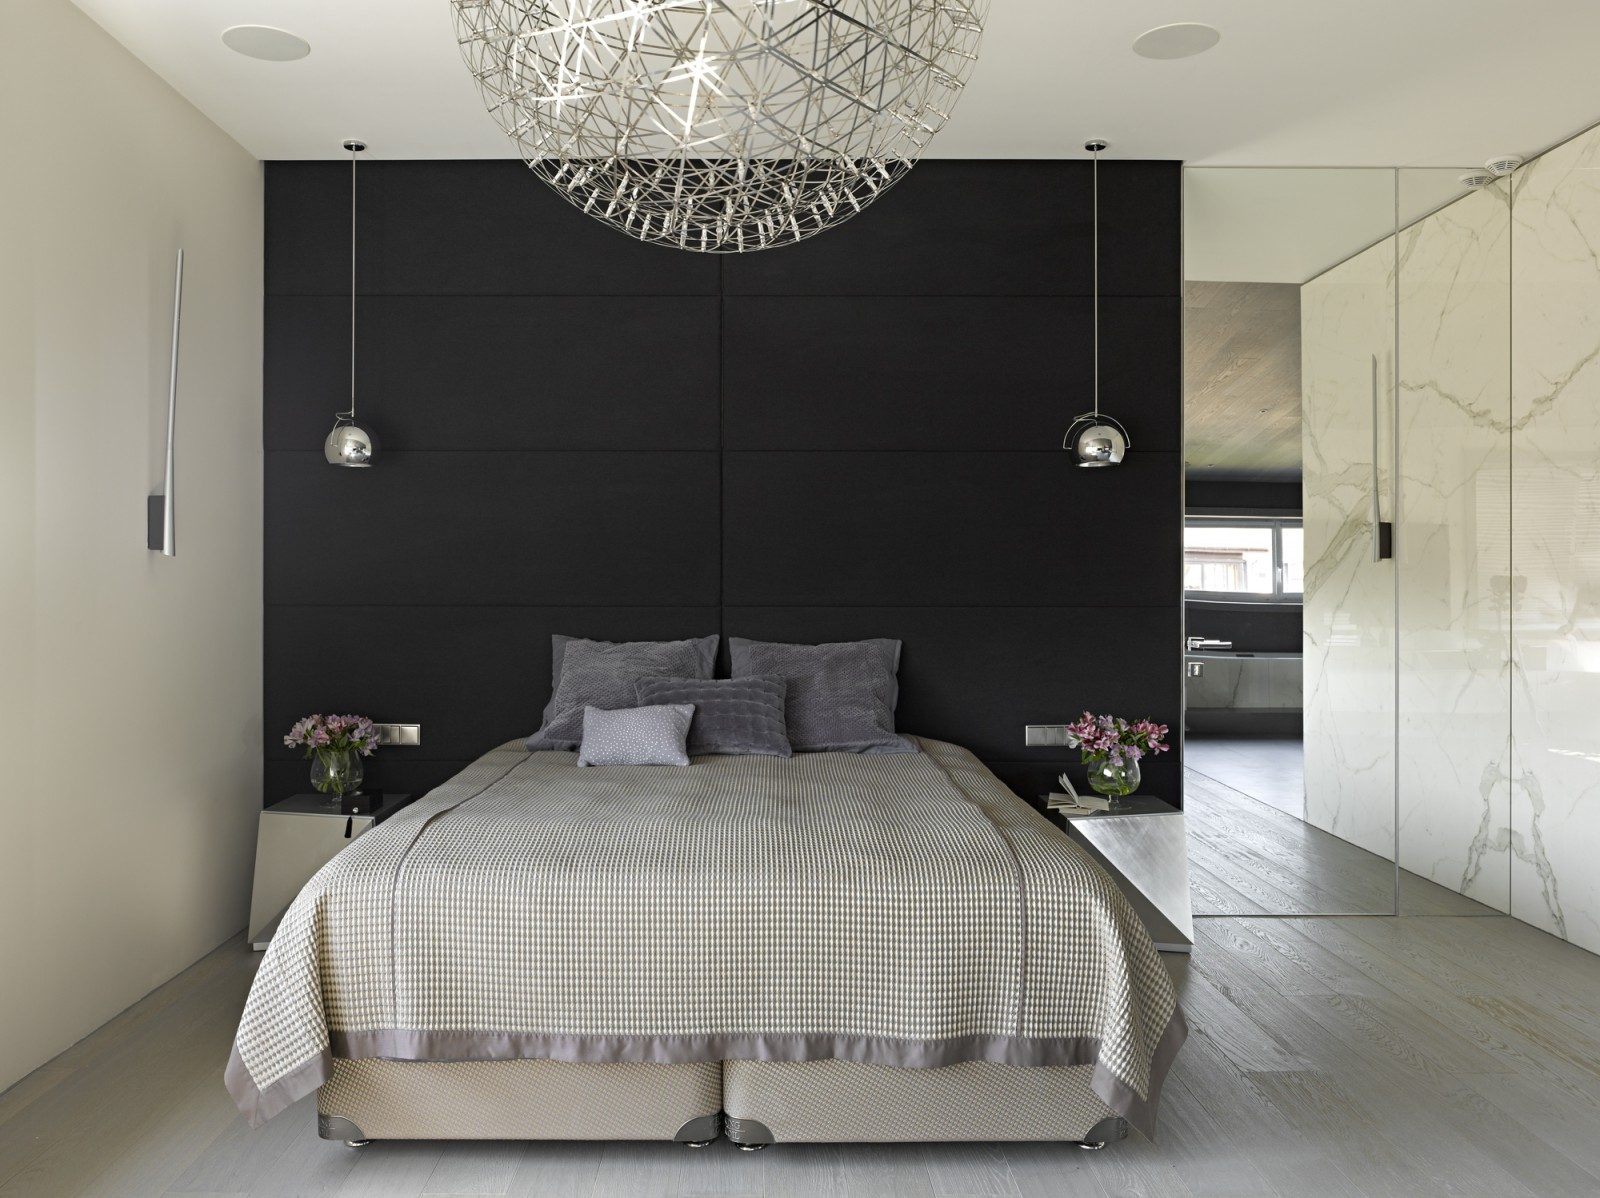 Nice villa interior by architectural Bureau of Alexandra Fedorova - 12